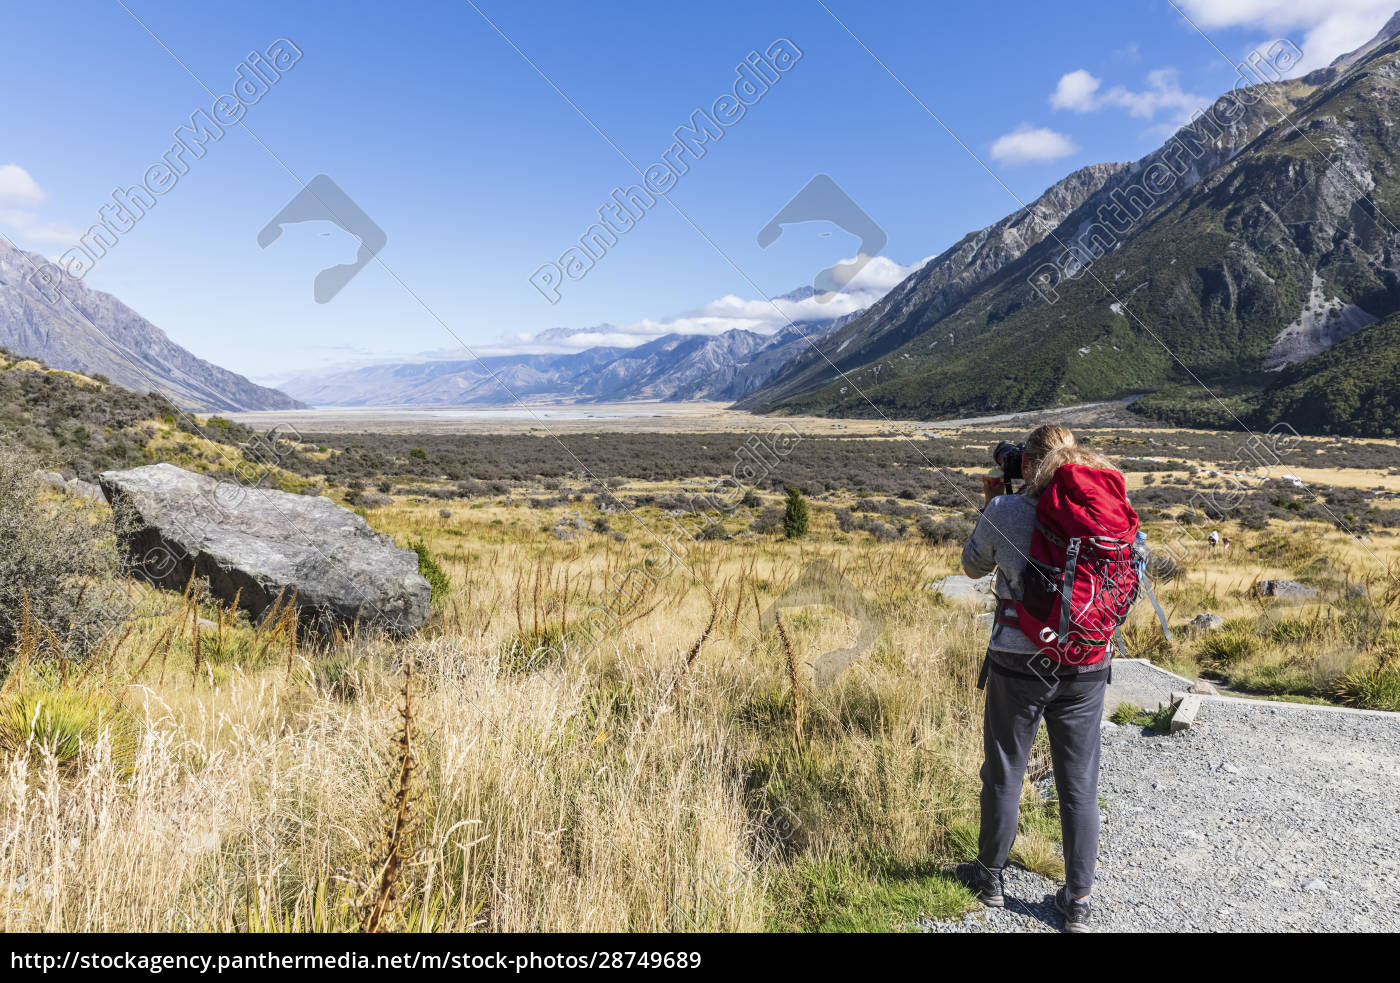 neuseeland, ozeanien, südinsel, canterbury, ben, ohau, südalpen, (neuseelandalpen), mount, cook, nationalpark, rückansicht, des - 28749689